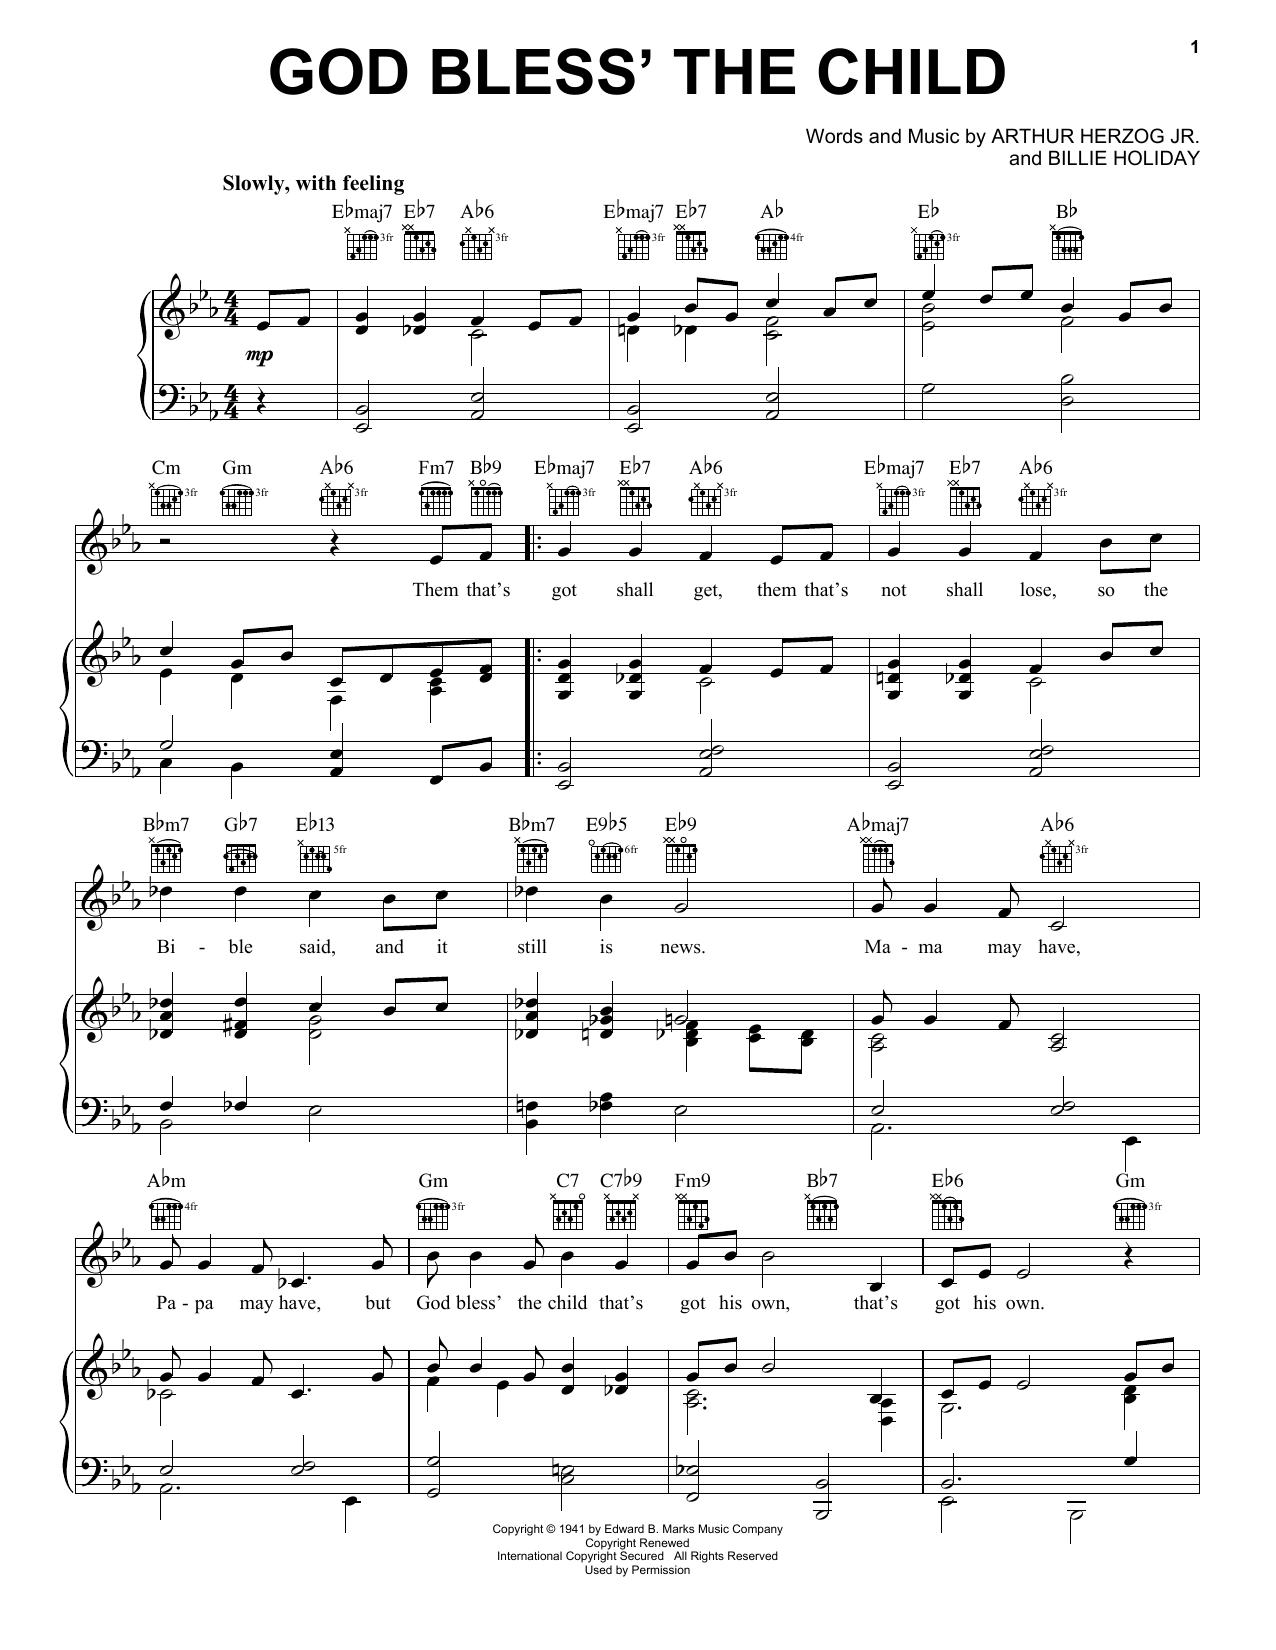 Sheet Music Digital Files To Print Licensed Billie Holiday Digital